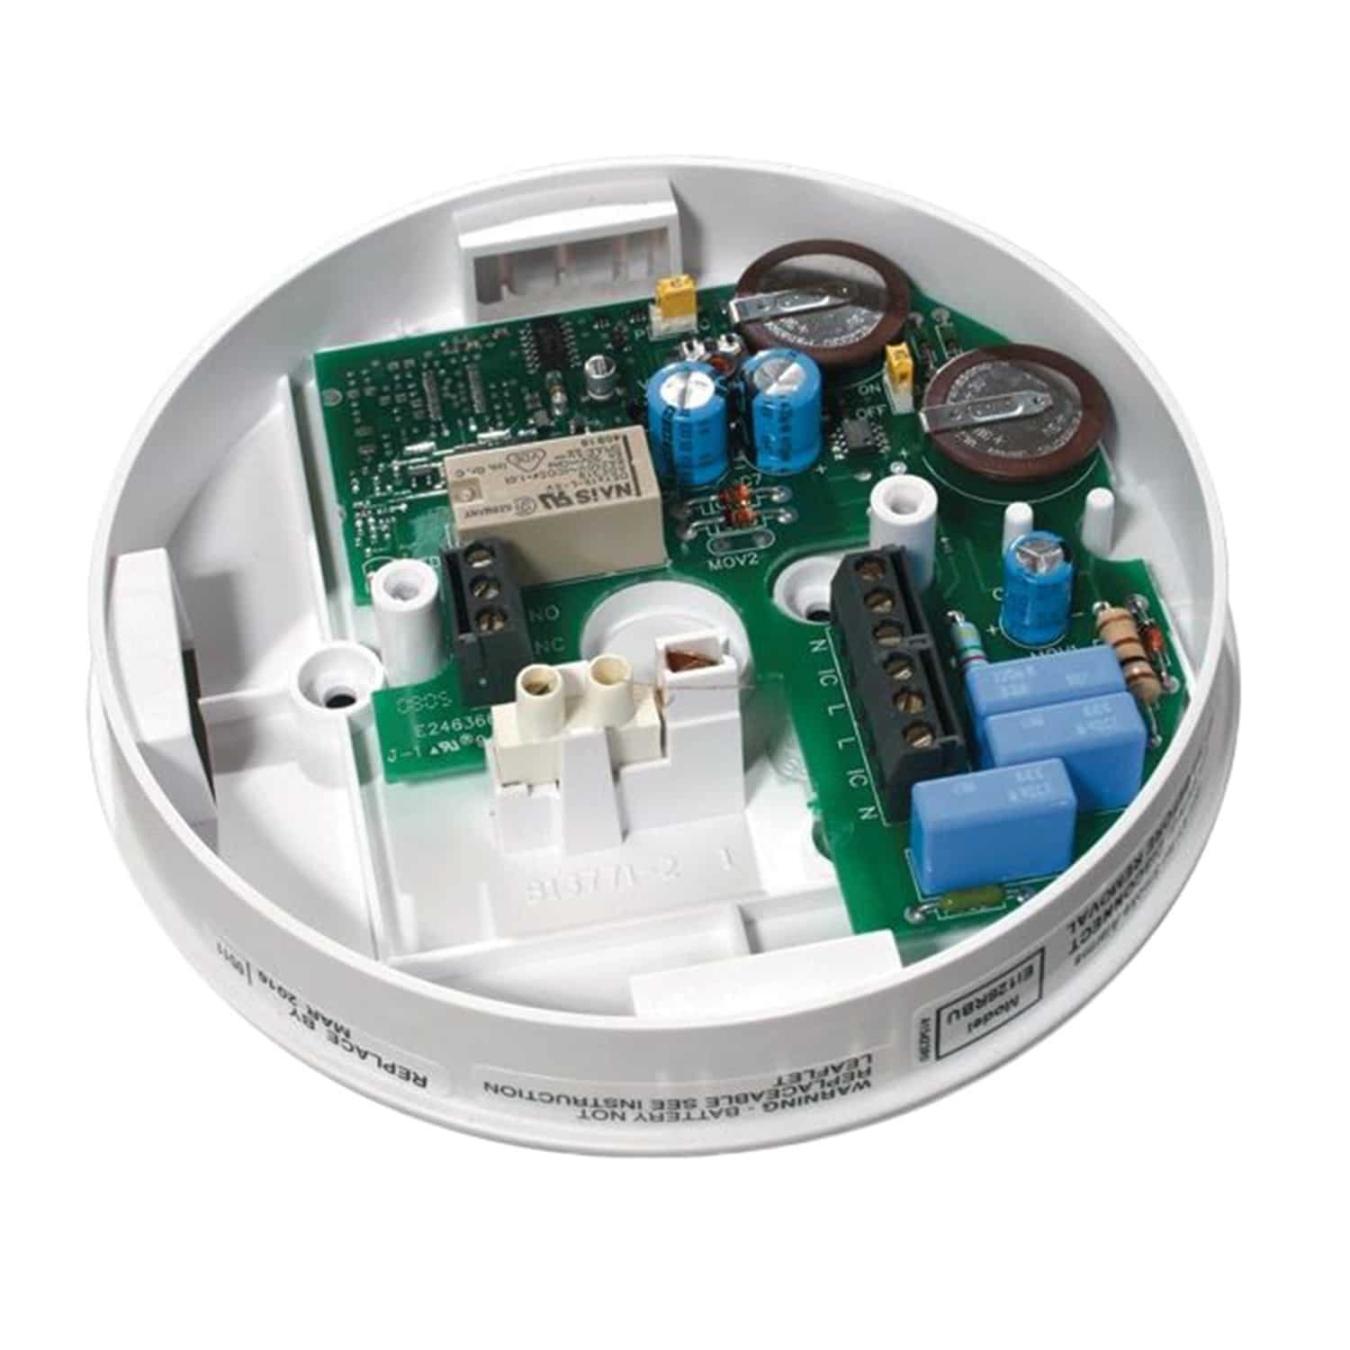 Koop EI 128RBU Opbouwsokkel relais bedraad